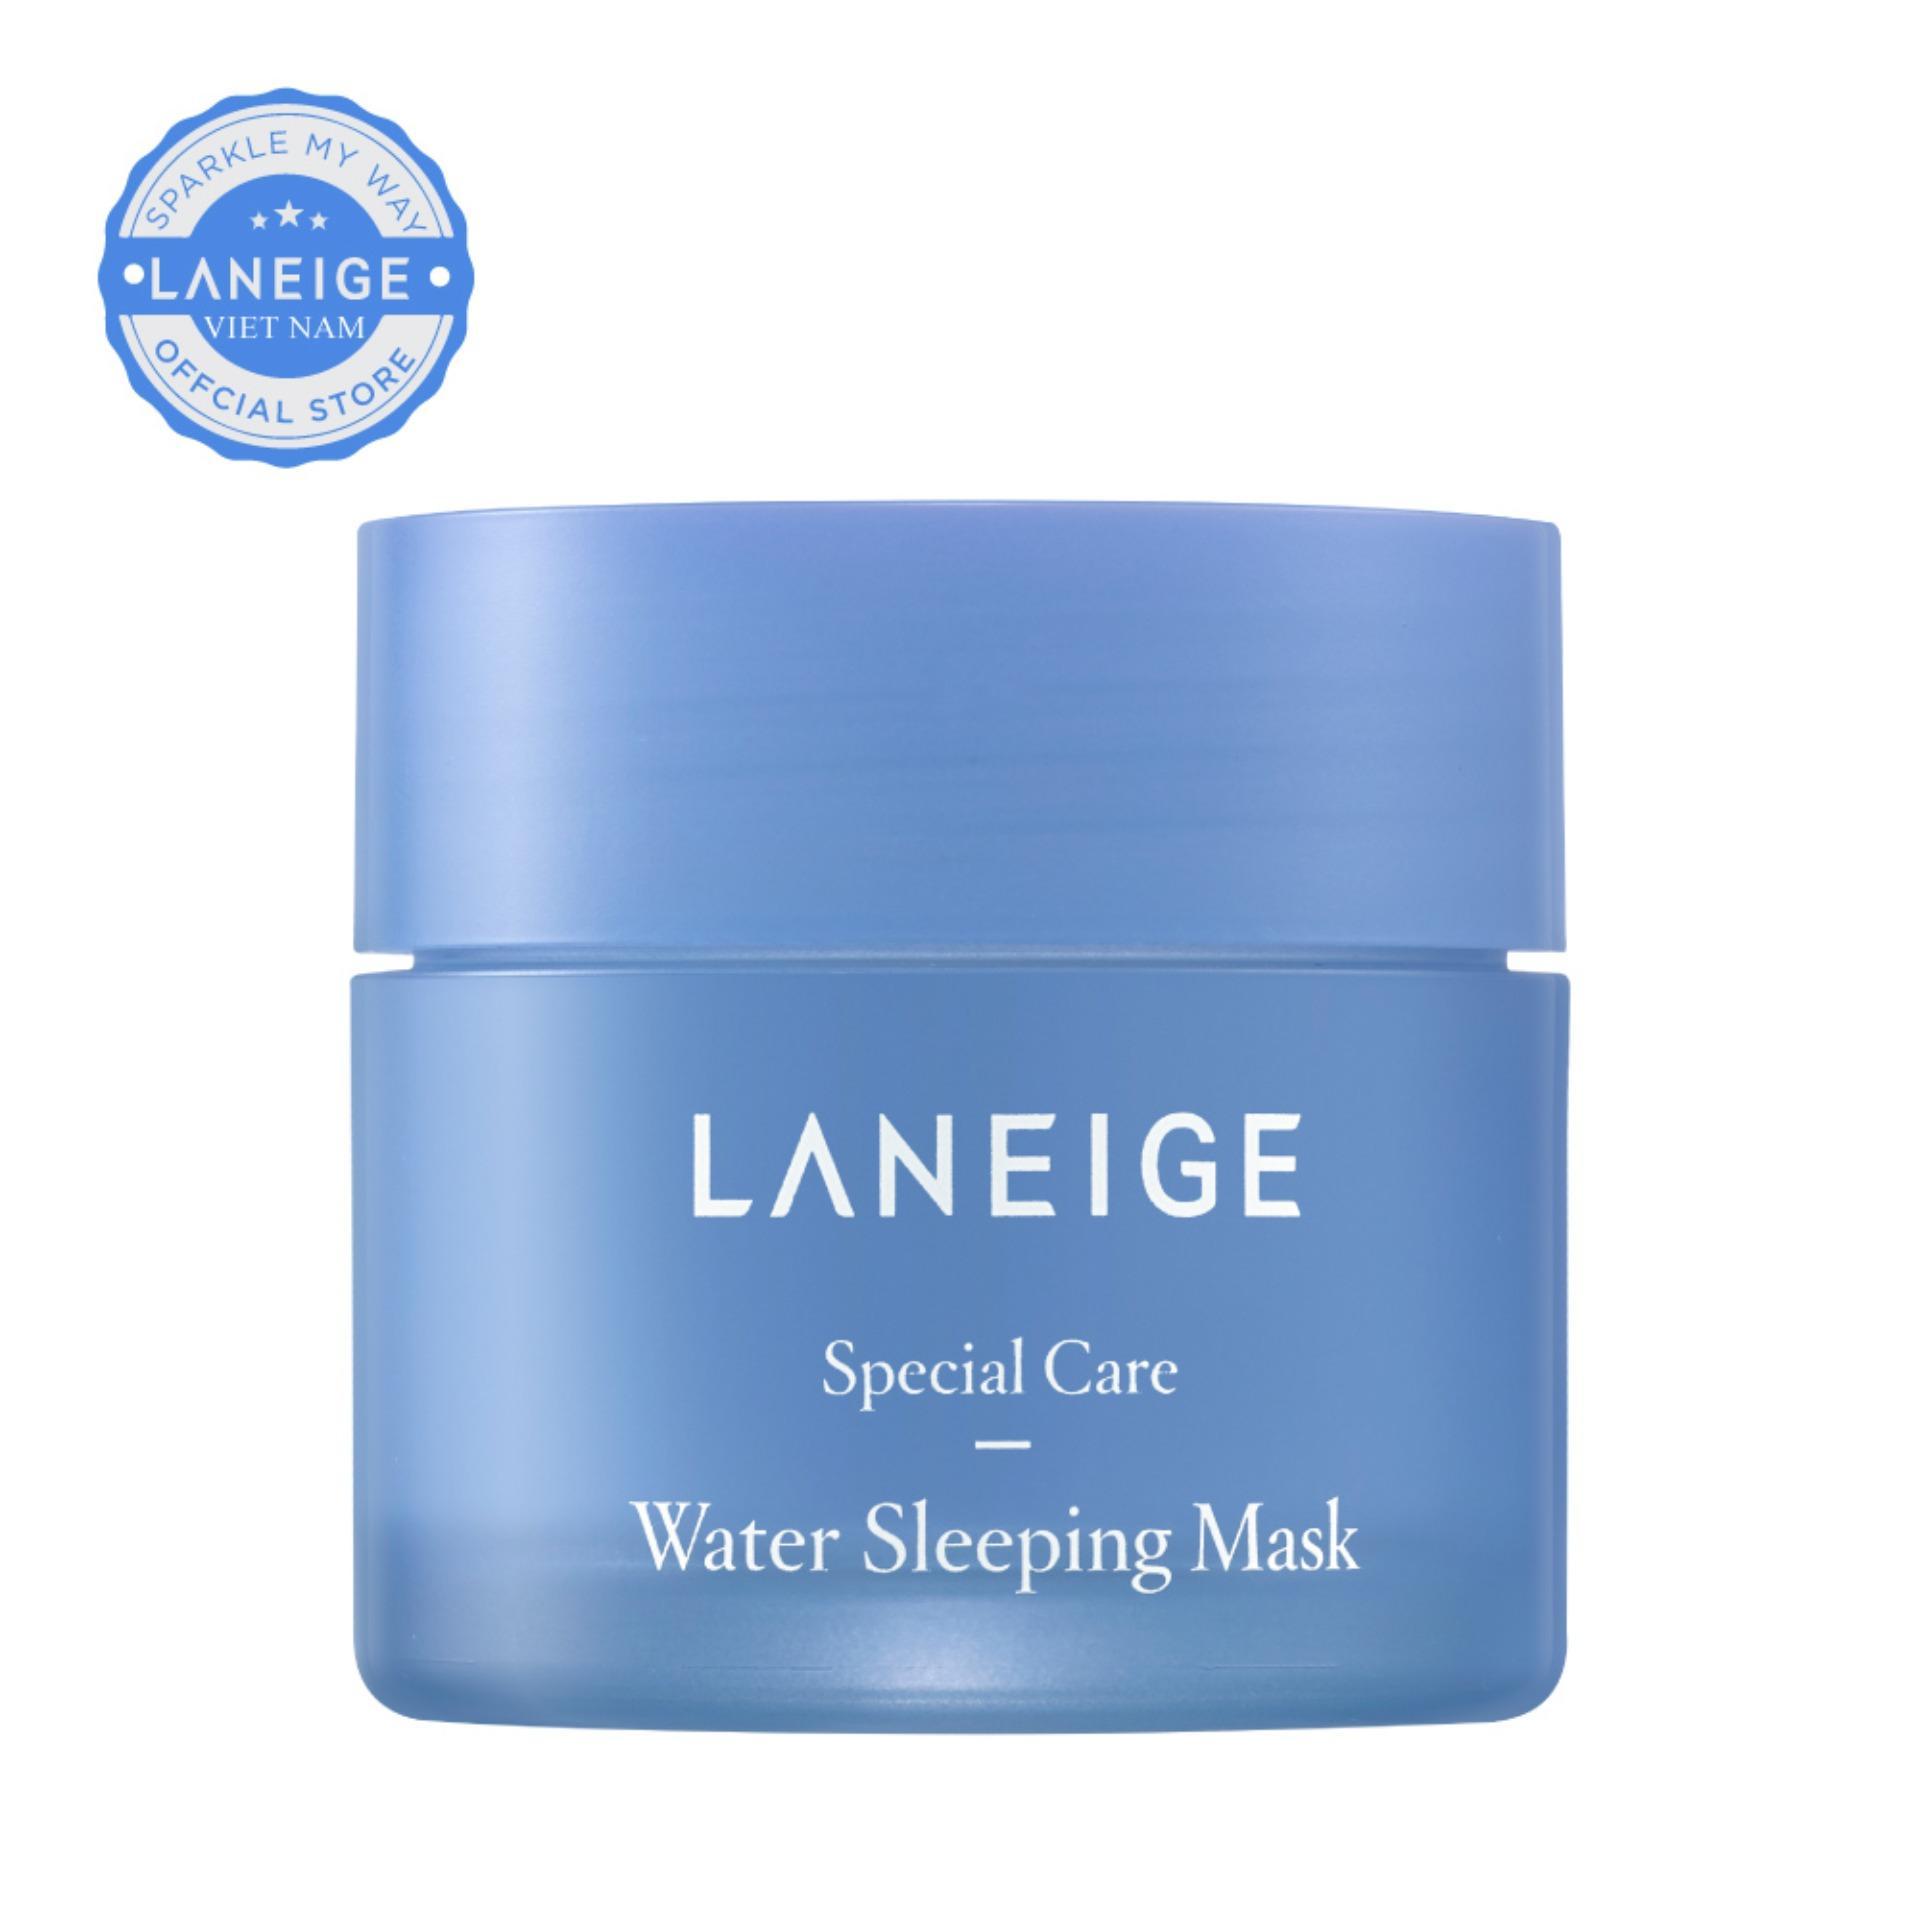 Mặt nạ ngủ dưỡng ẩm Laneige Water Sleeping Mask Miniature 25ml